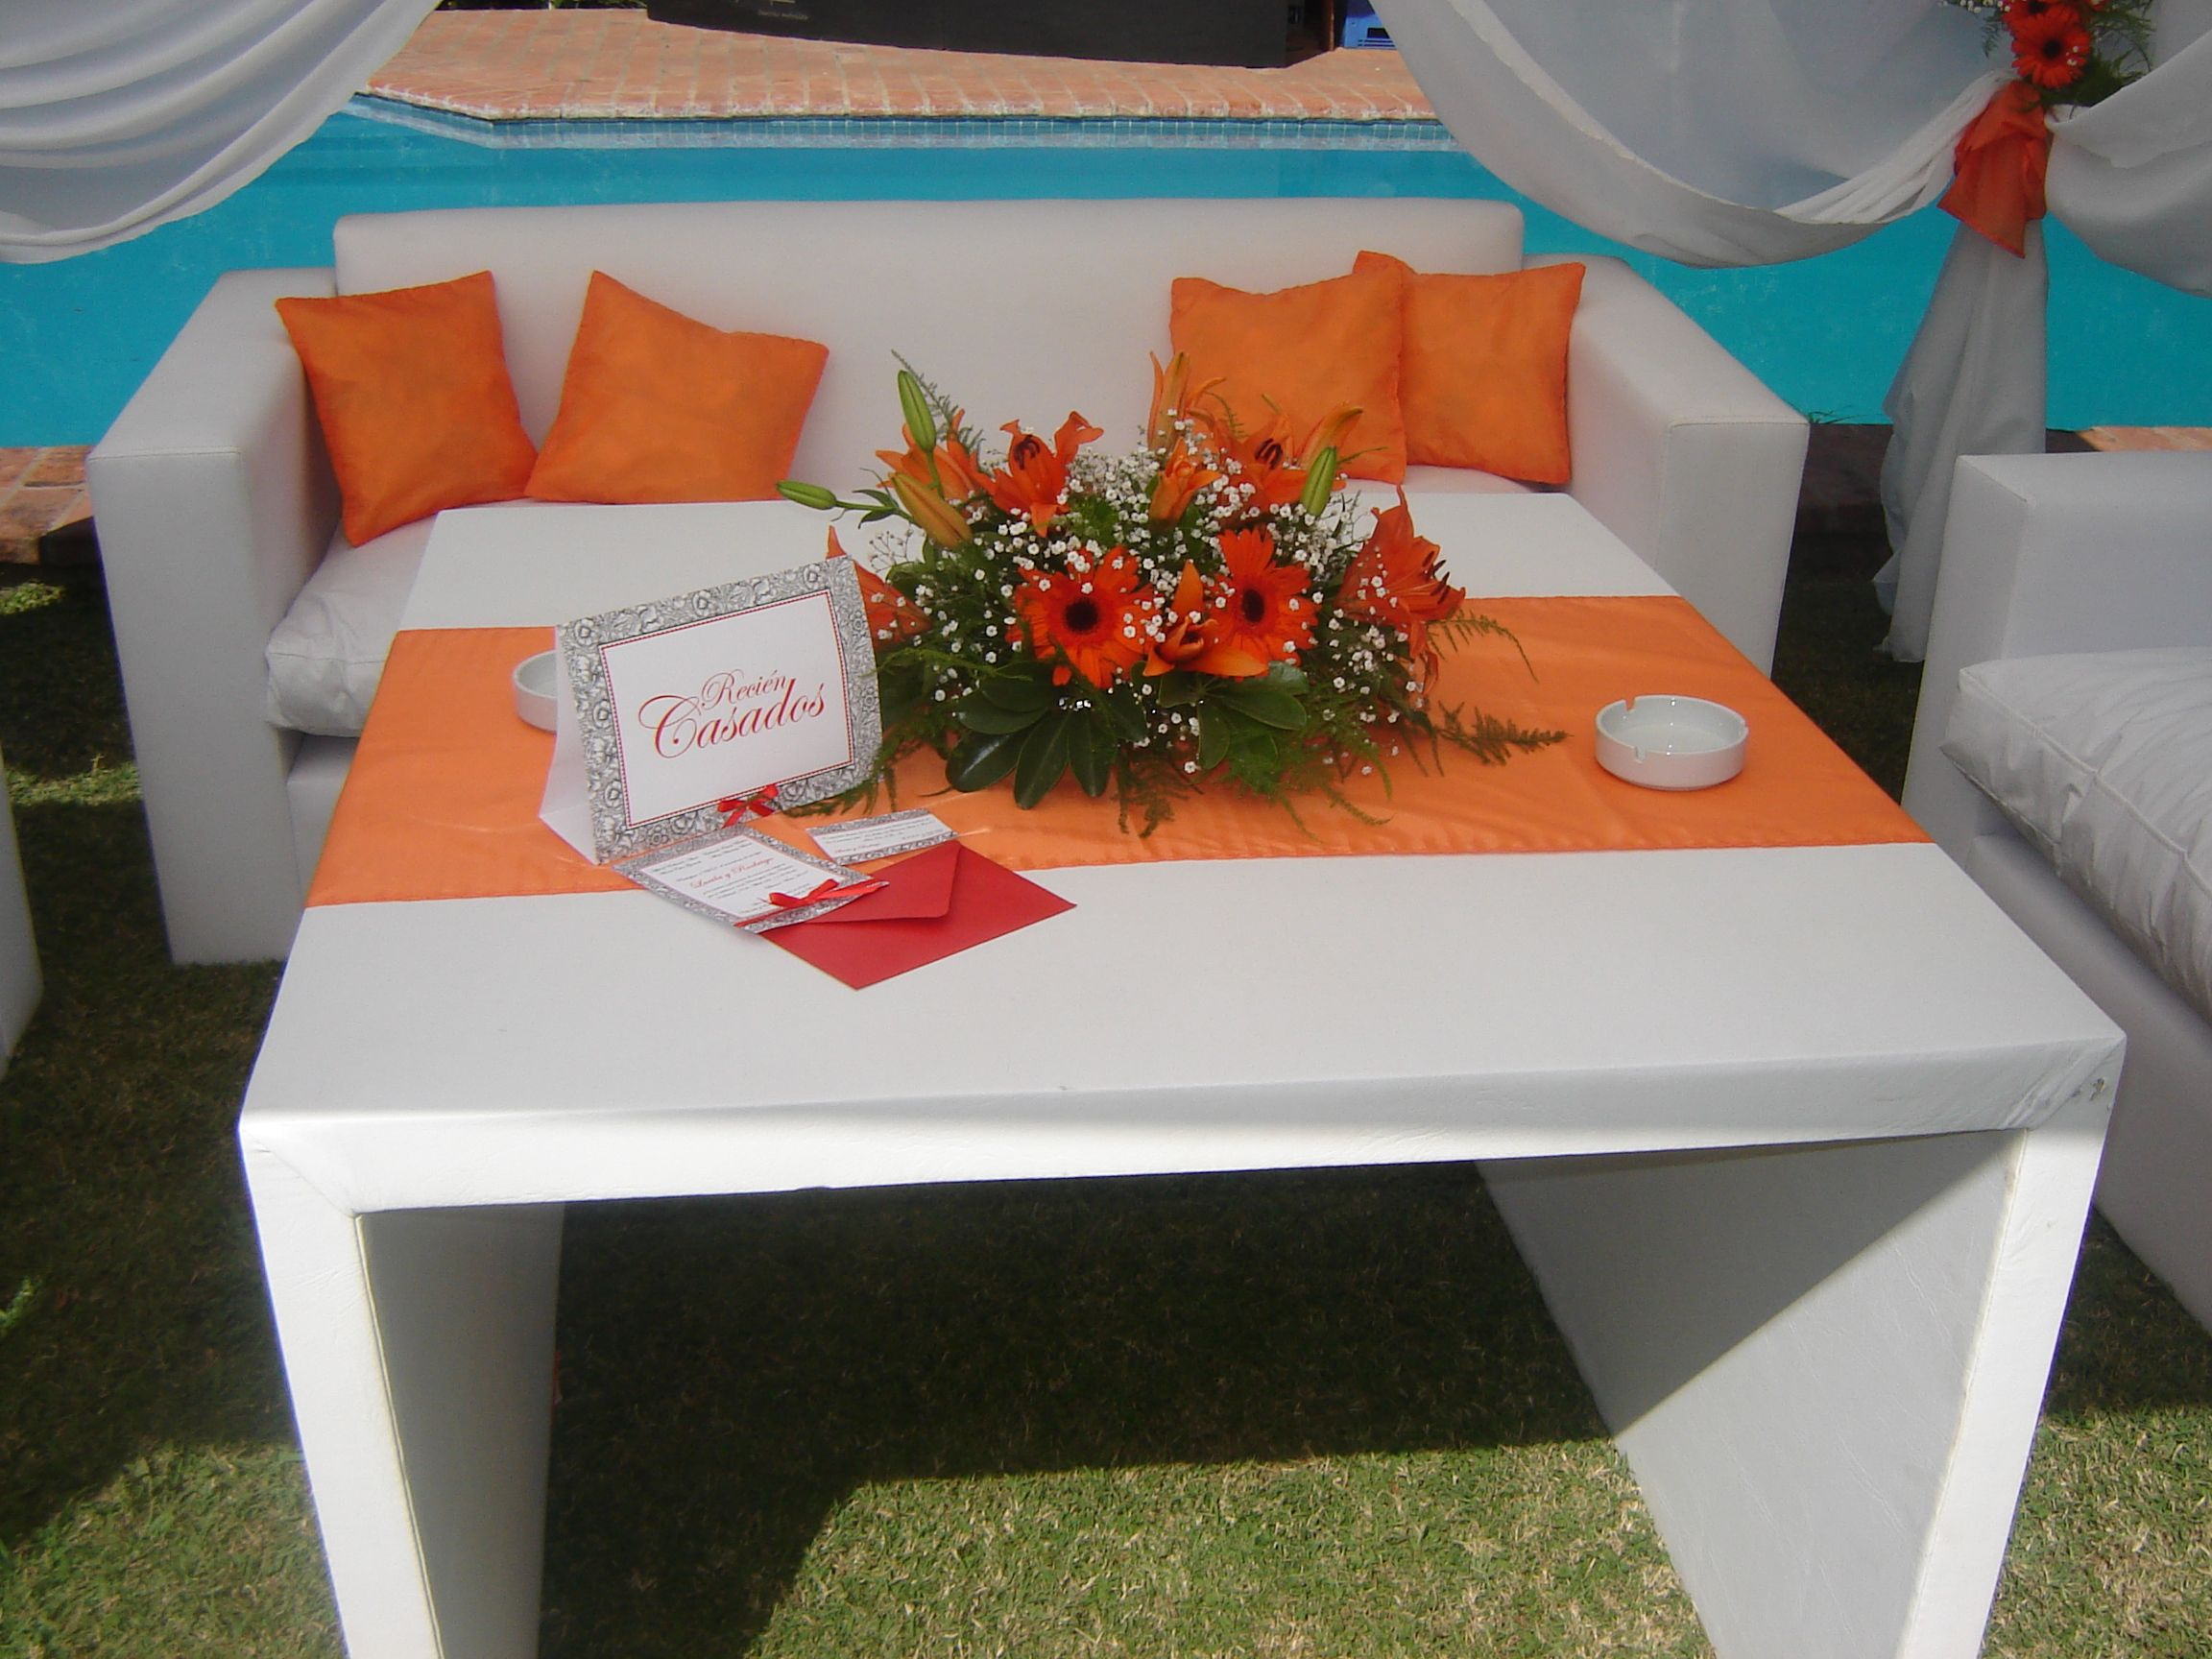 Boda en naranja todo para tu boda pinterest naranja for Decoracion hogar naranja